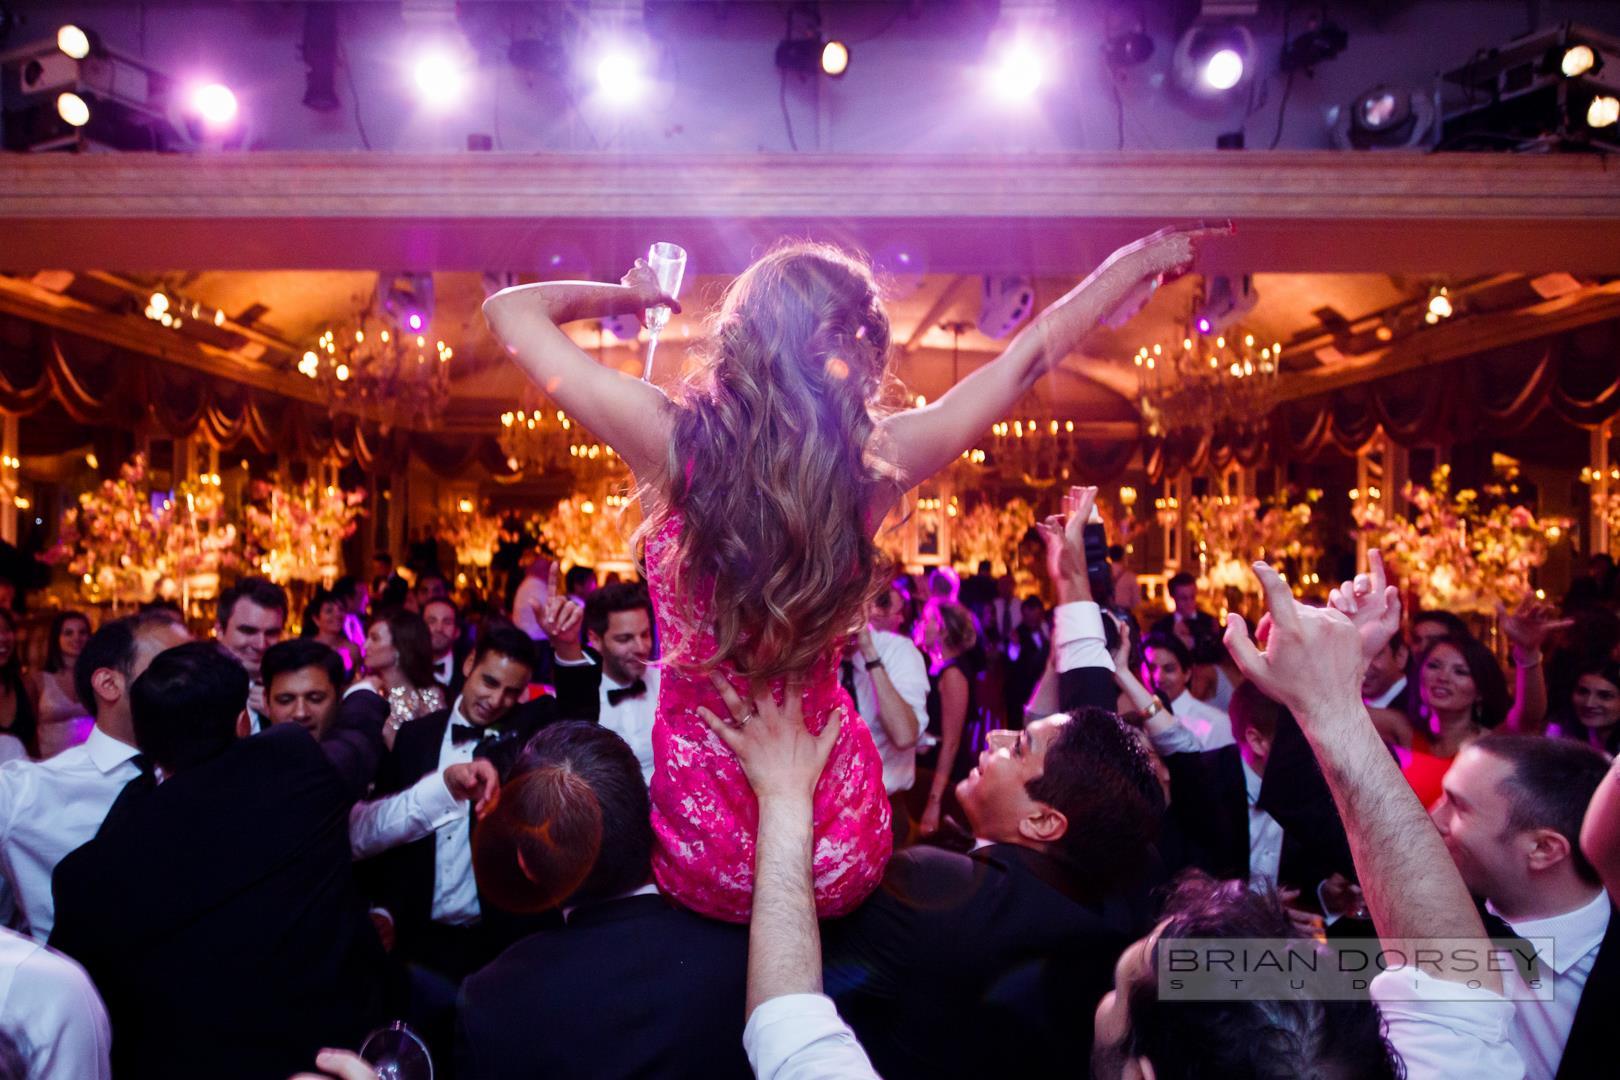 Indian bride dancing at wedding